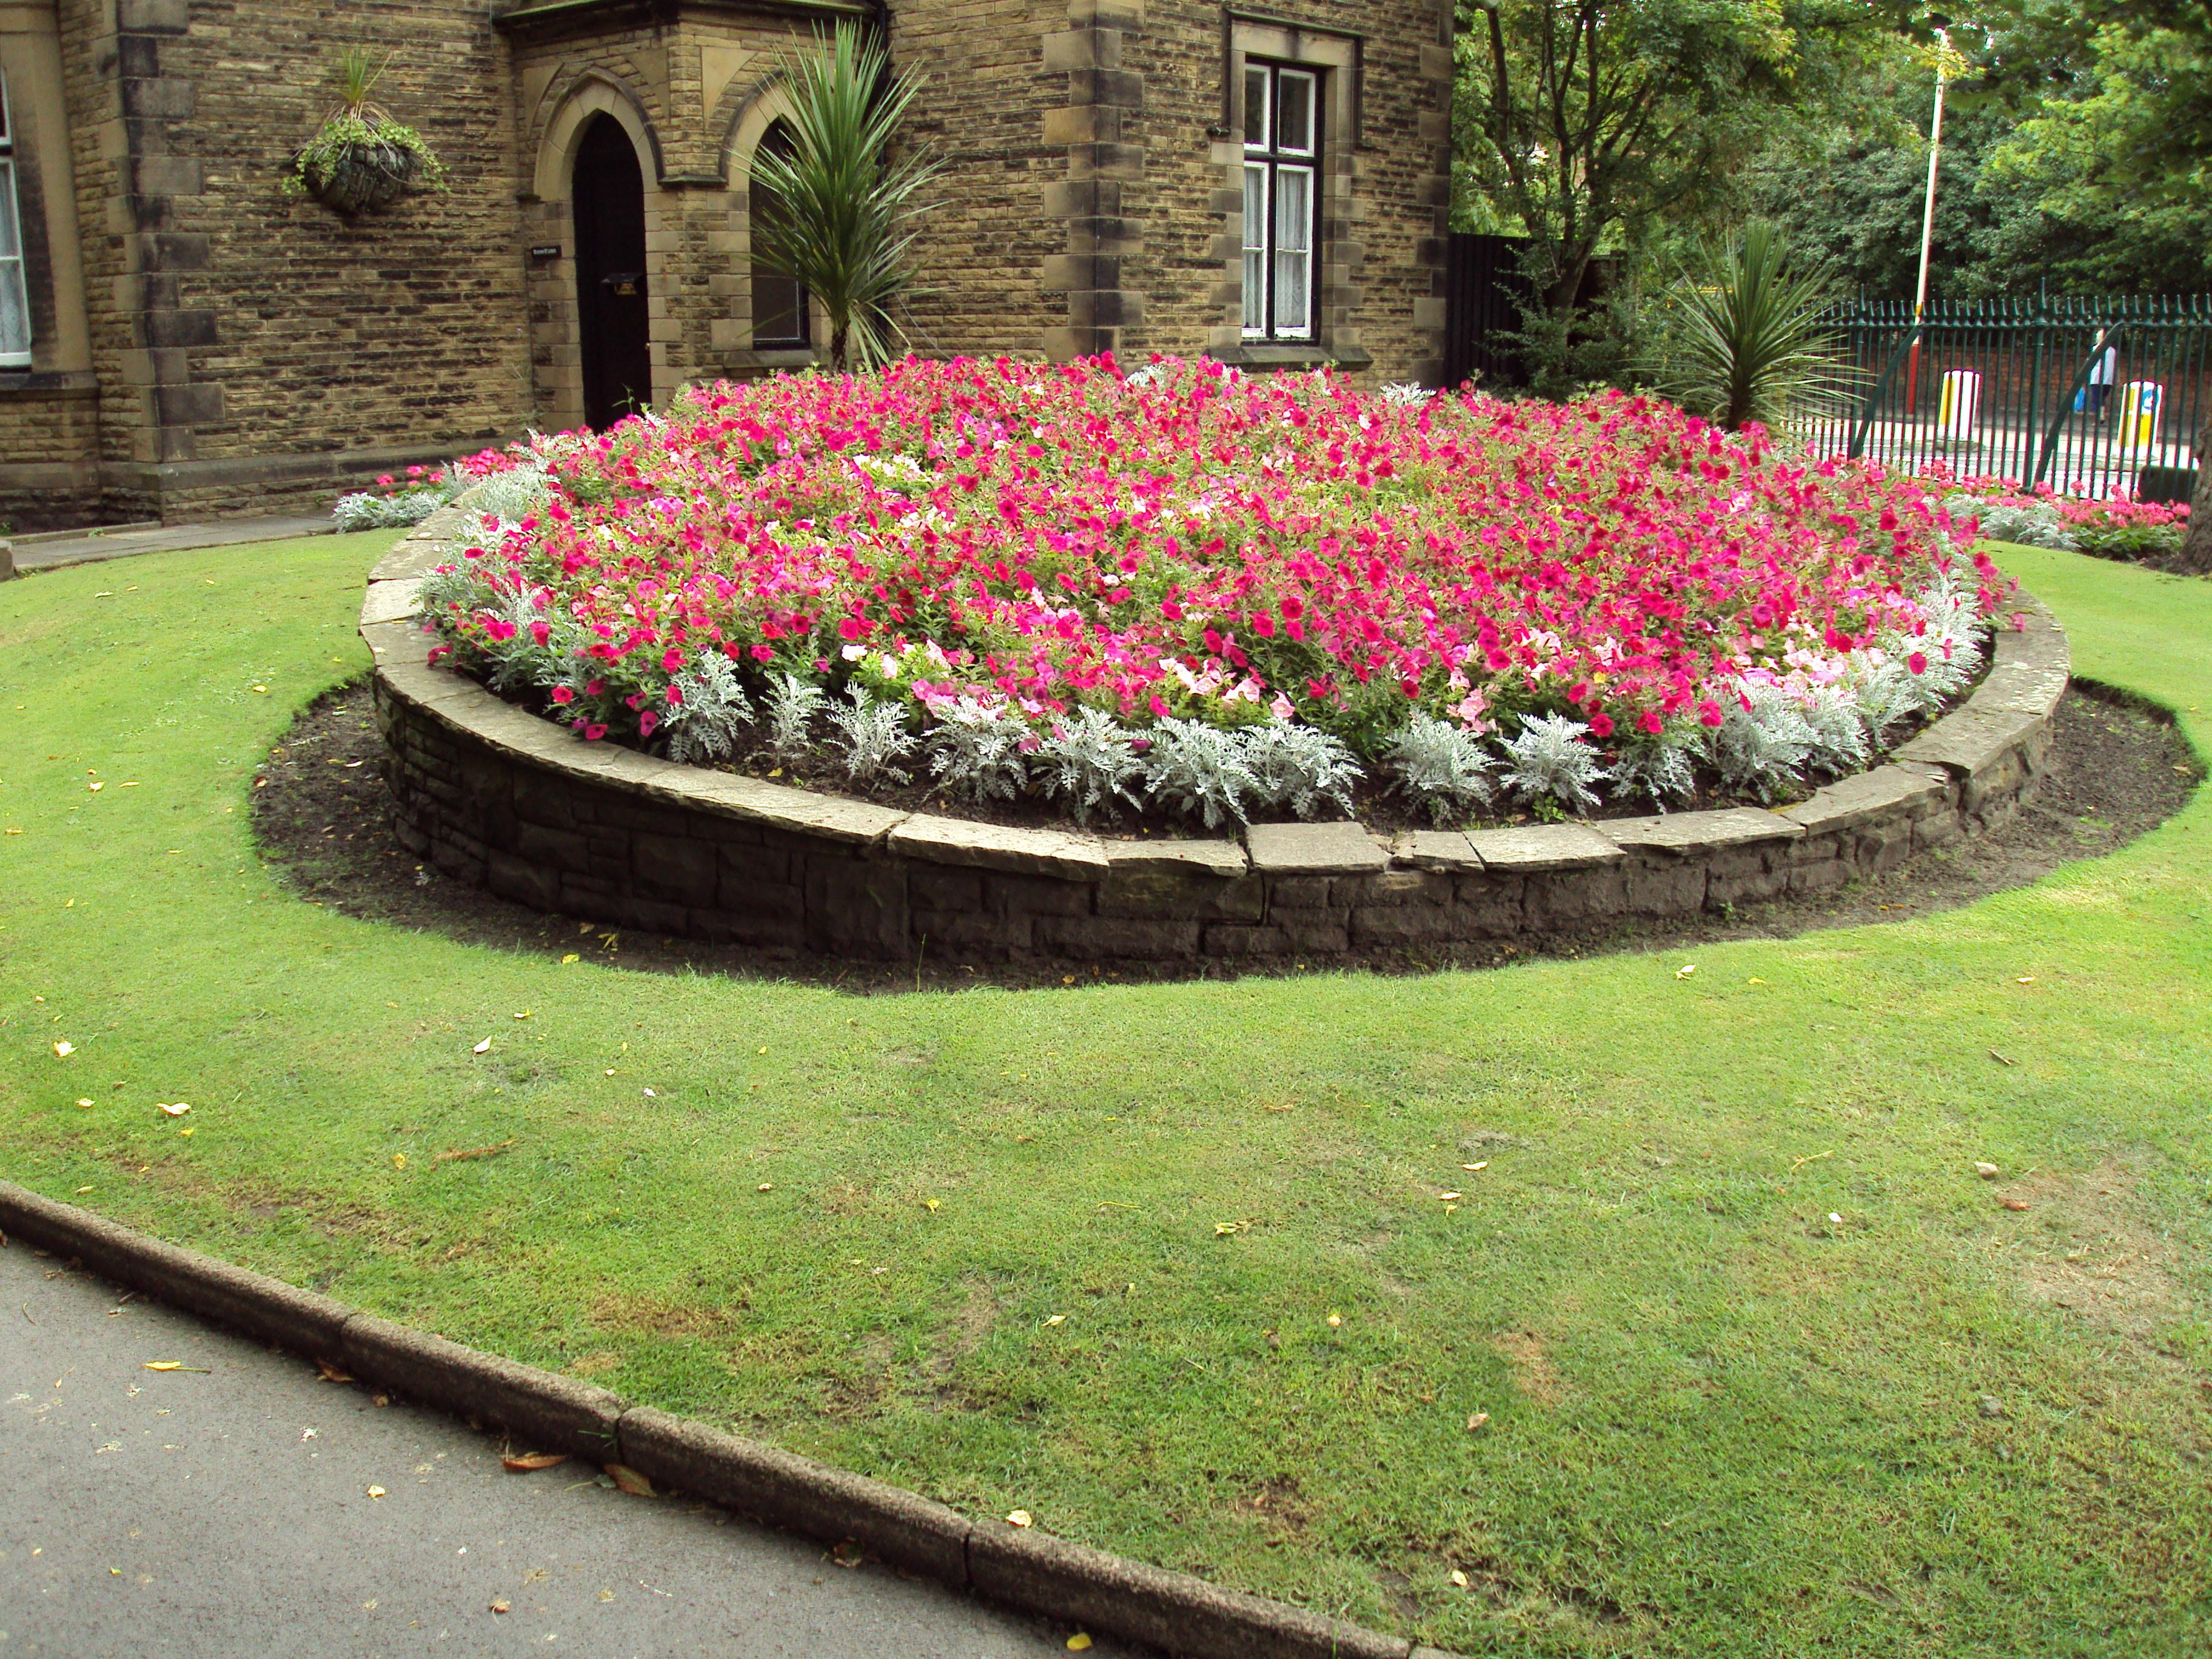 File:Flowerbed, Hesketh Park 1.JPG - Wikimedia Commons